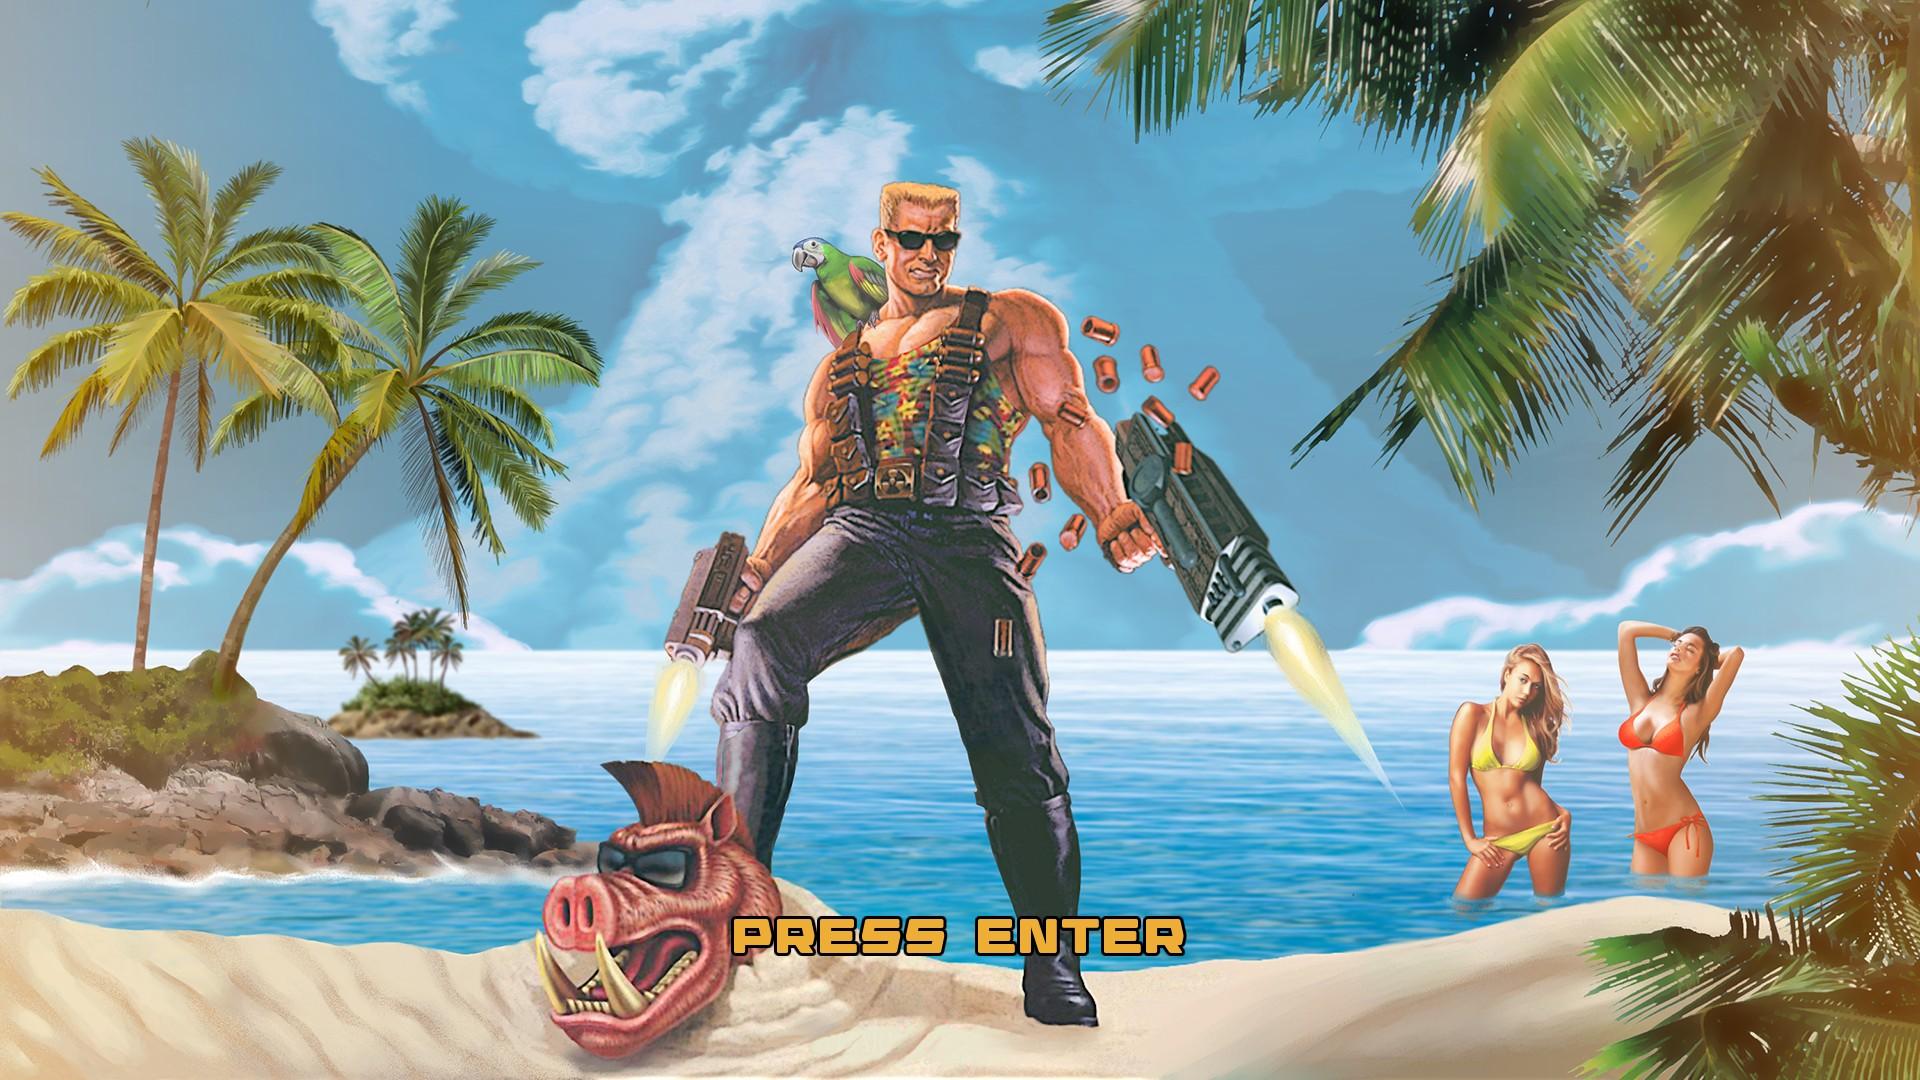 Add Media Report RSS Duke Nukem 3D Megaton Expansions View Original